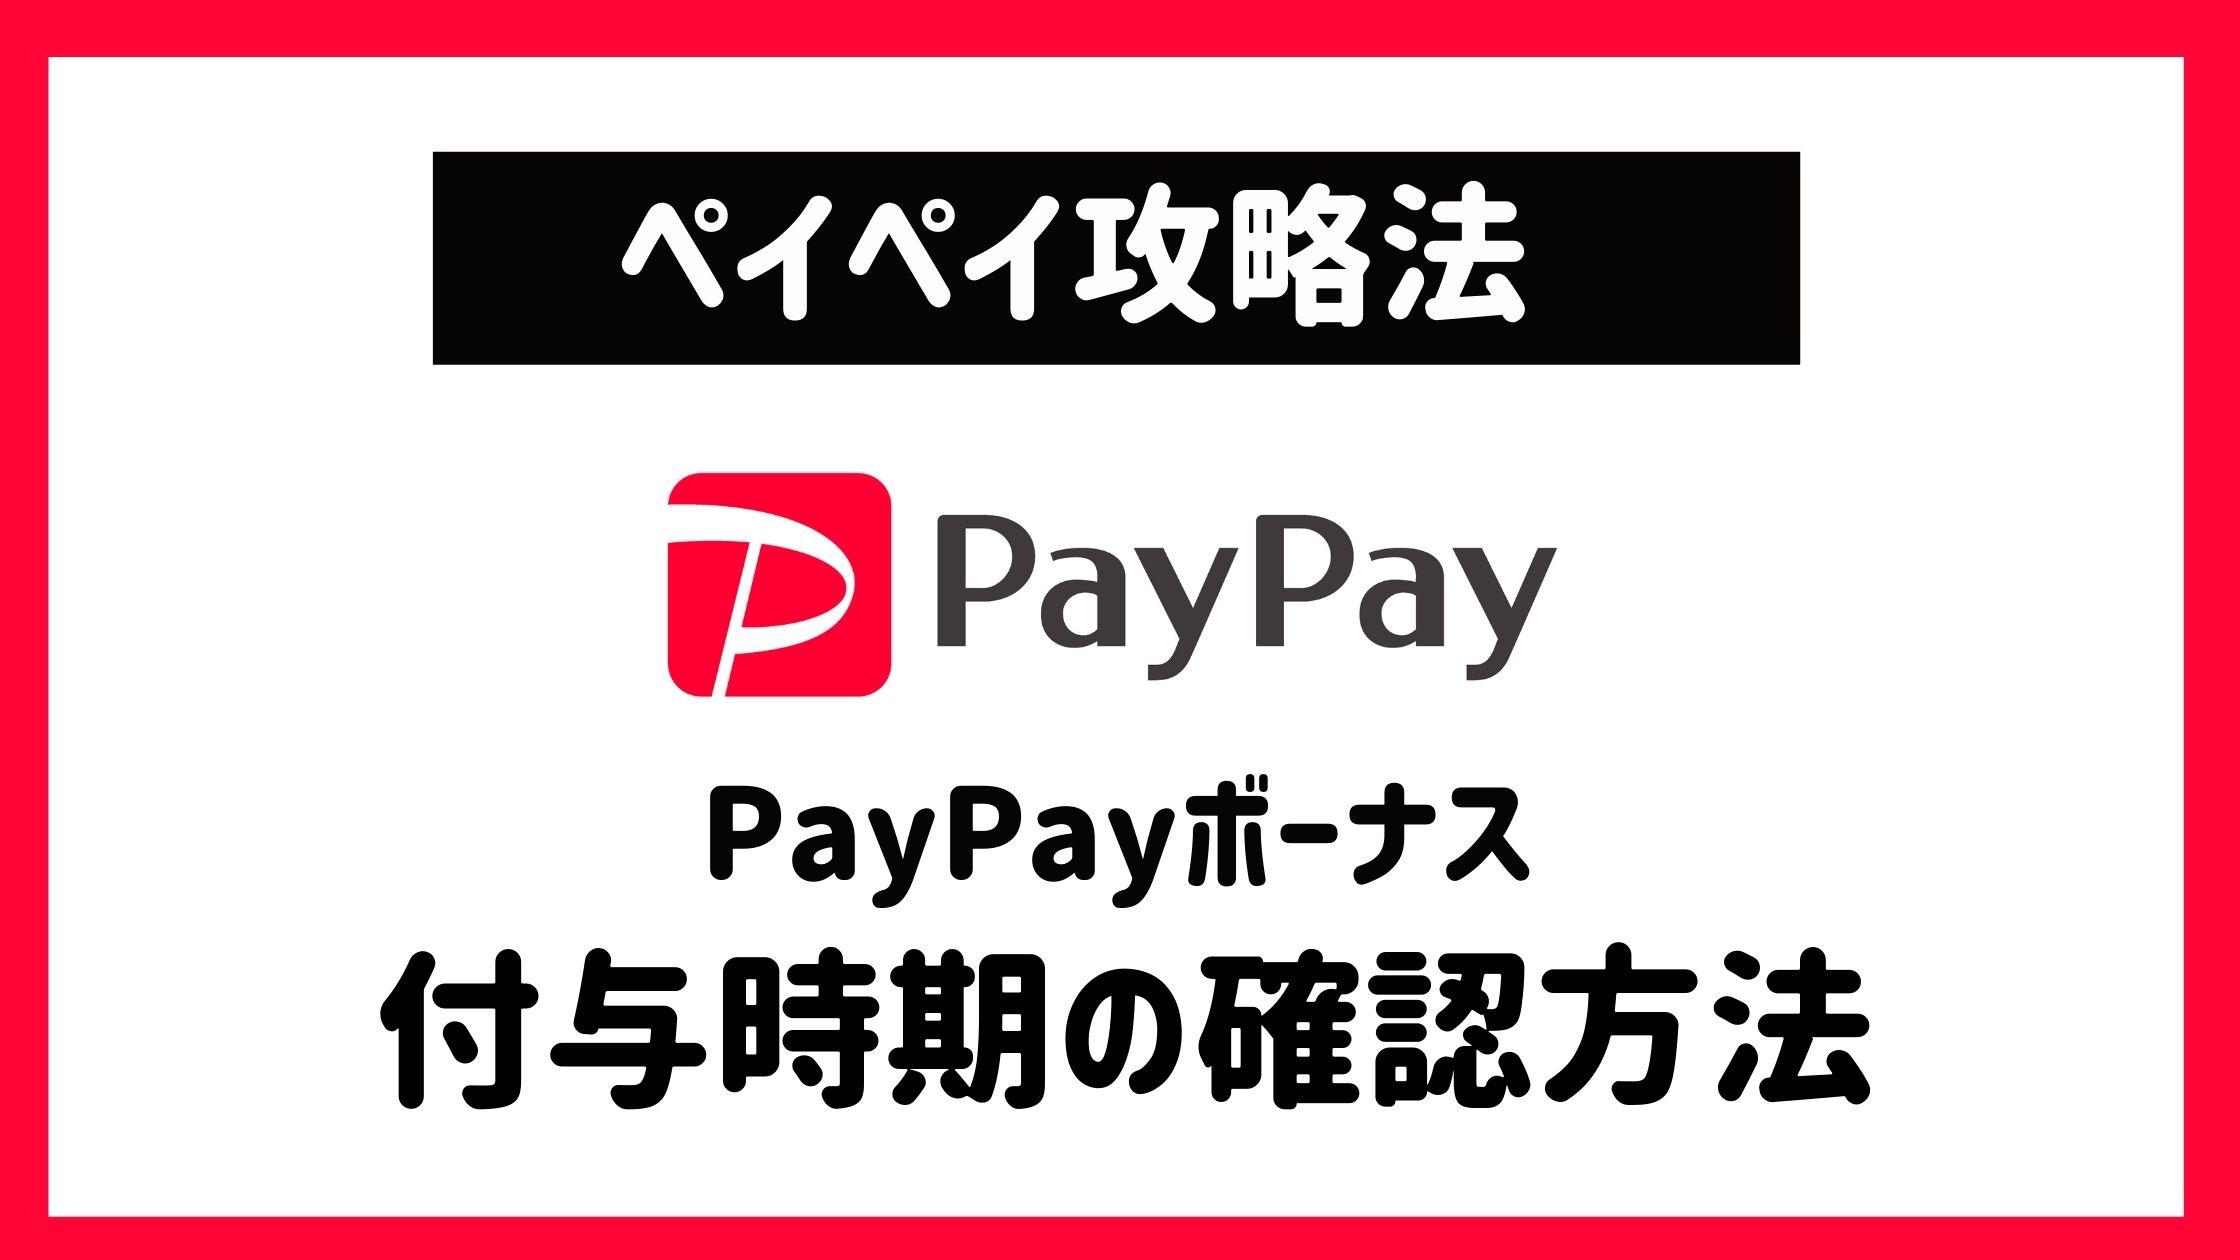 PayPay ボーナス 付与 手順 確認